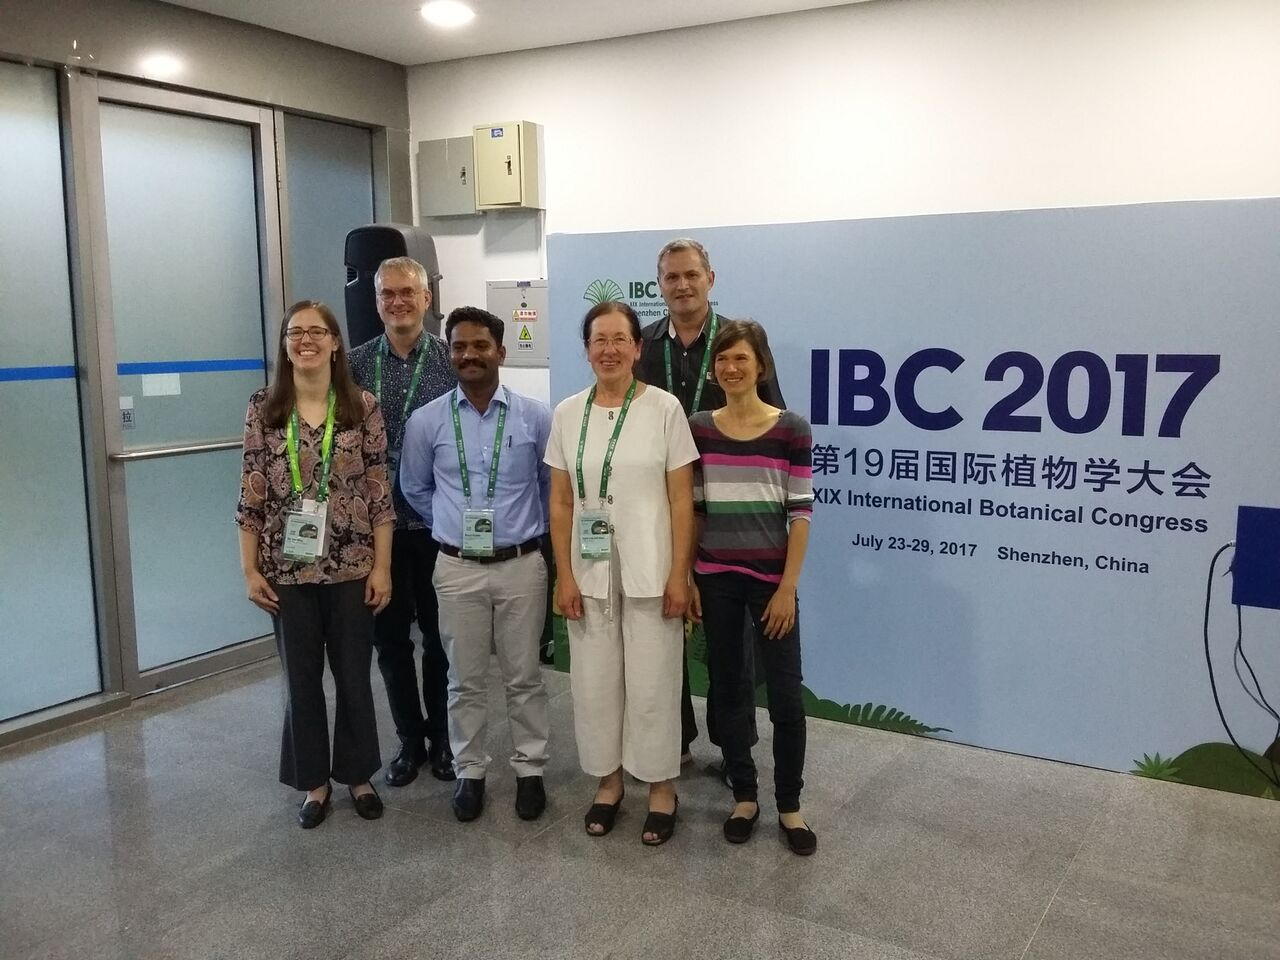 IBC 28 - Apocs